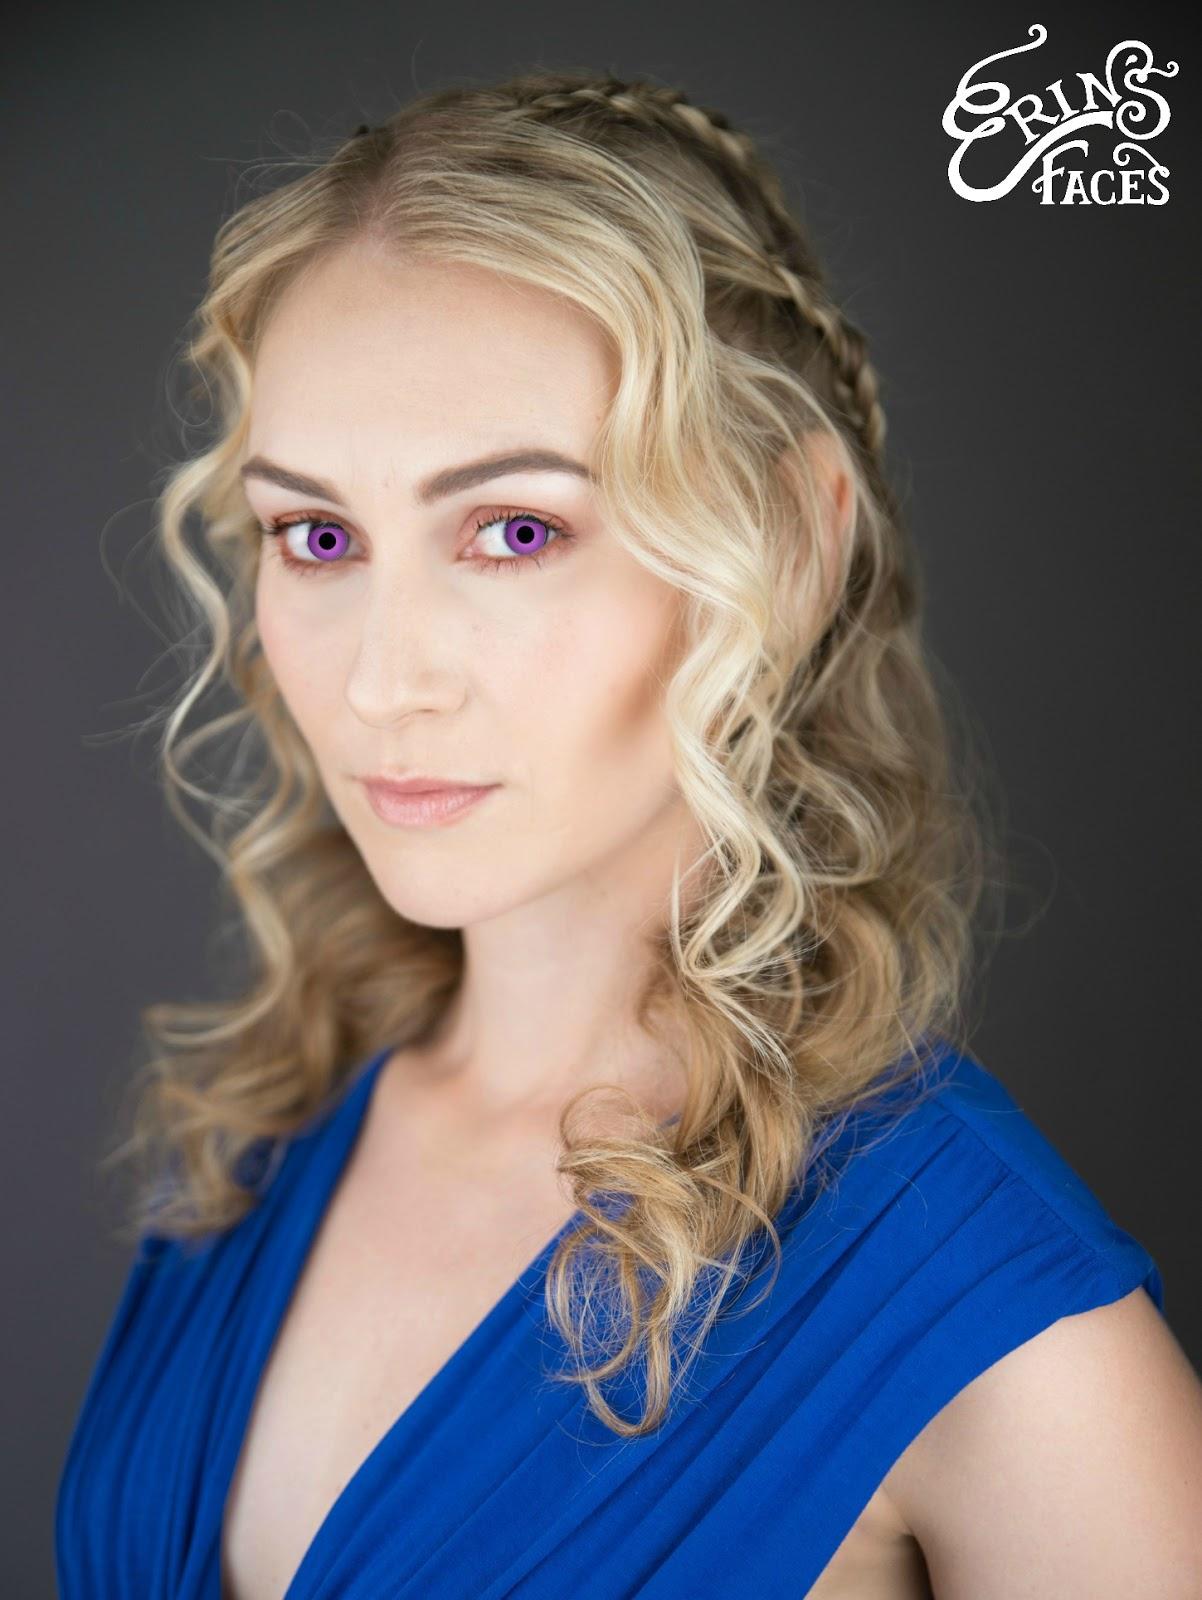 Erins faces daenerys targaryen khaleesi makeup tutorial photo by billy b photography baditri Images